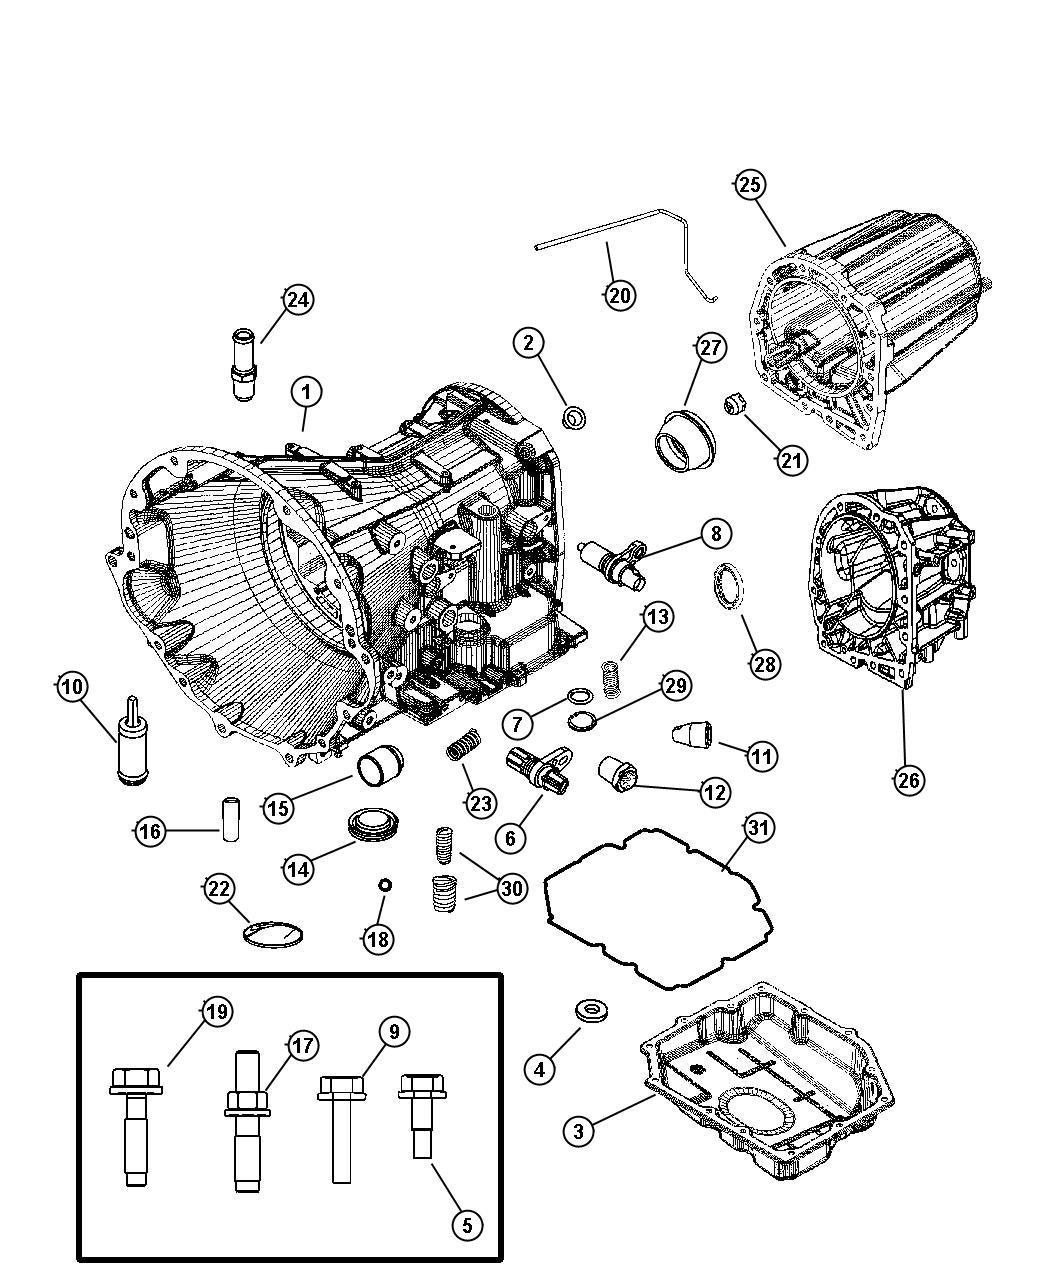 2007 Dodge Nitro Adapter  Transfer Case  Transmission  Extension  Block